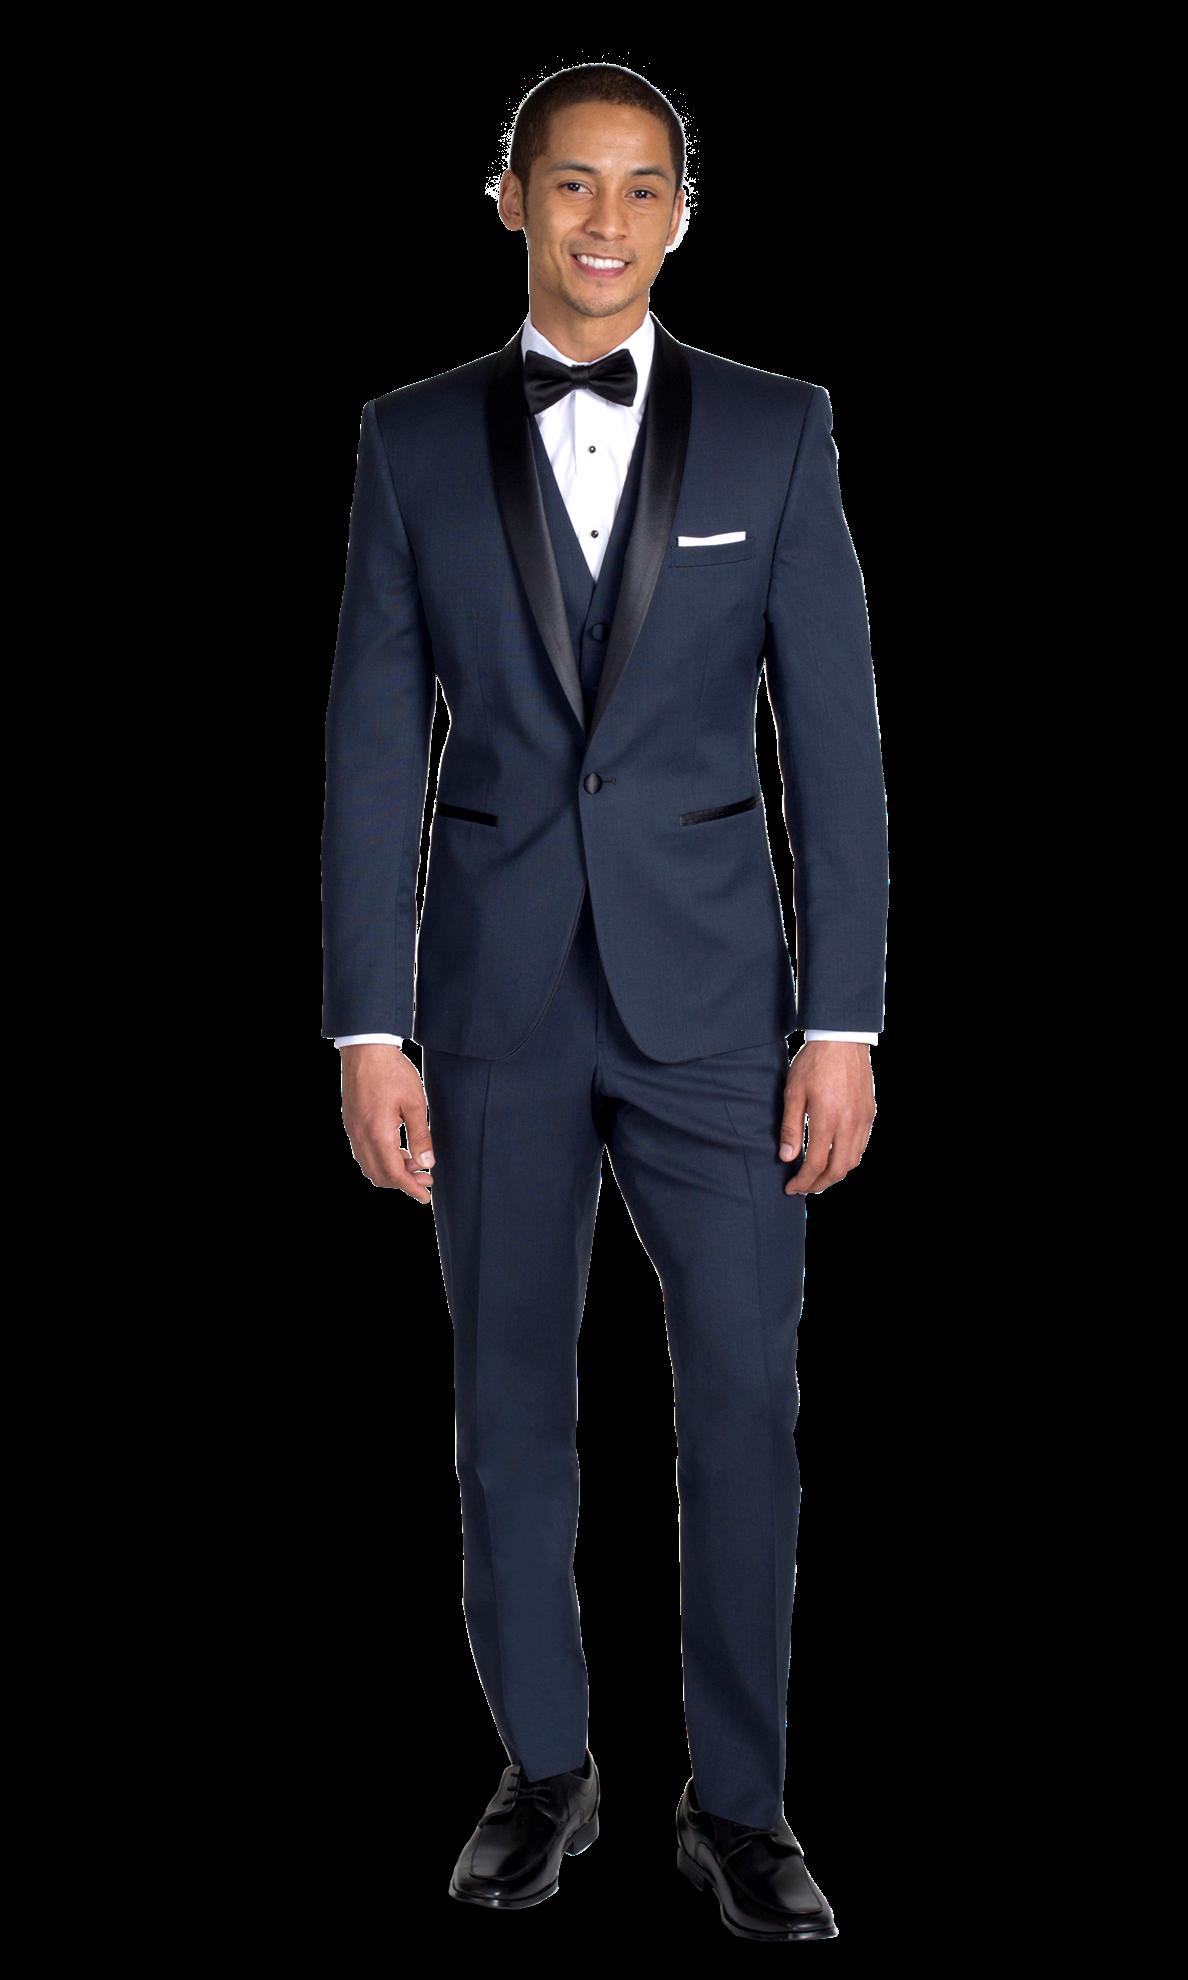 Navy Shawl Lapel Tuxedo - Front View - PNG Tuxedo